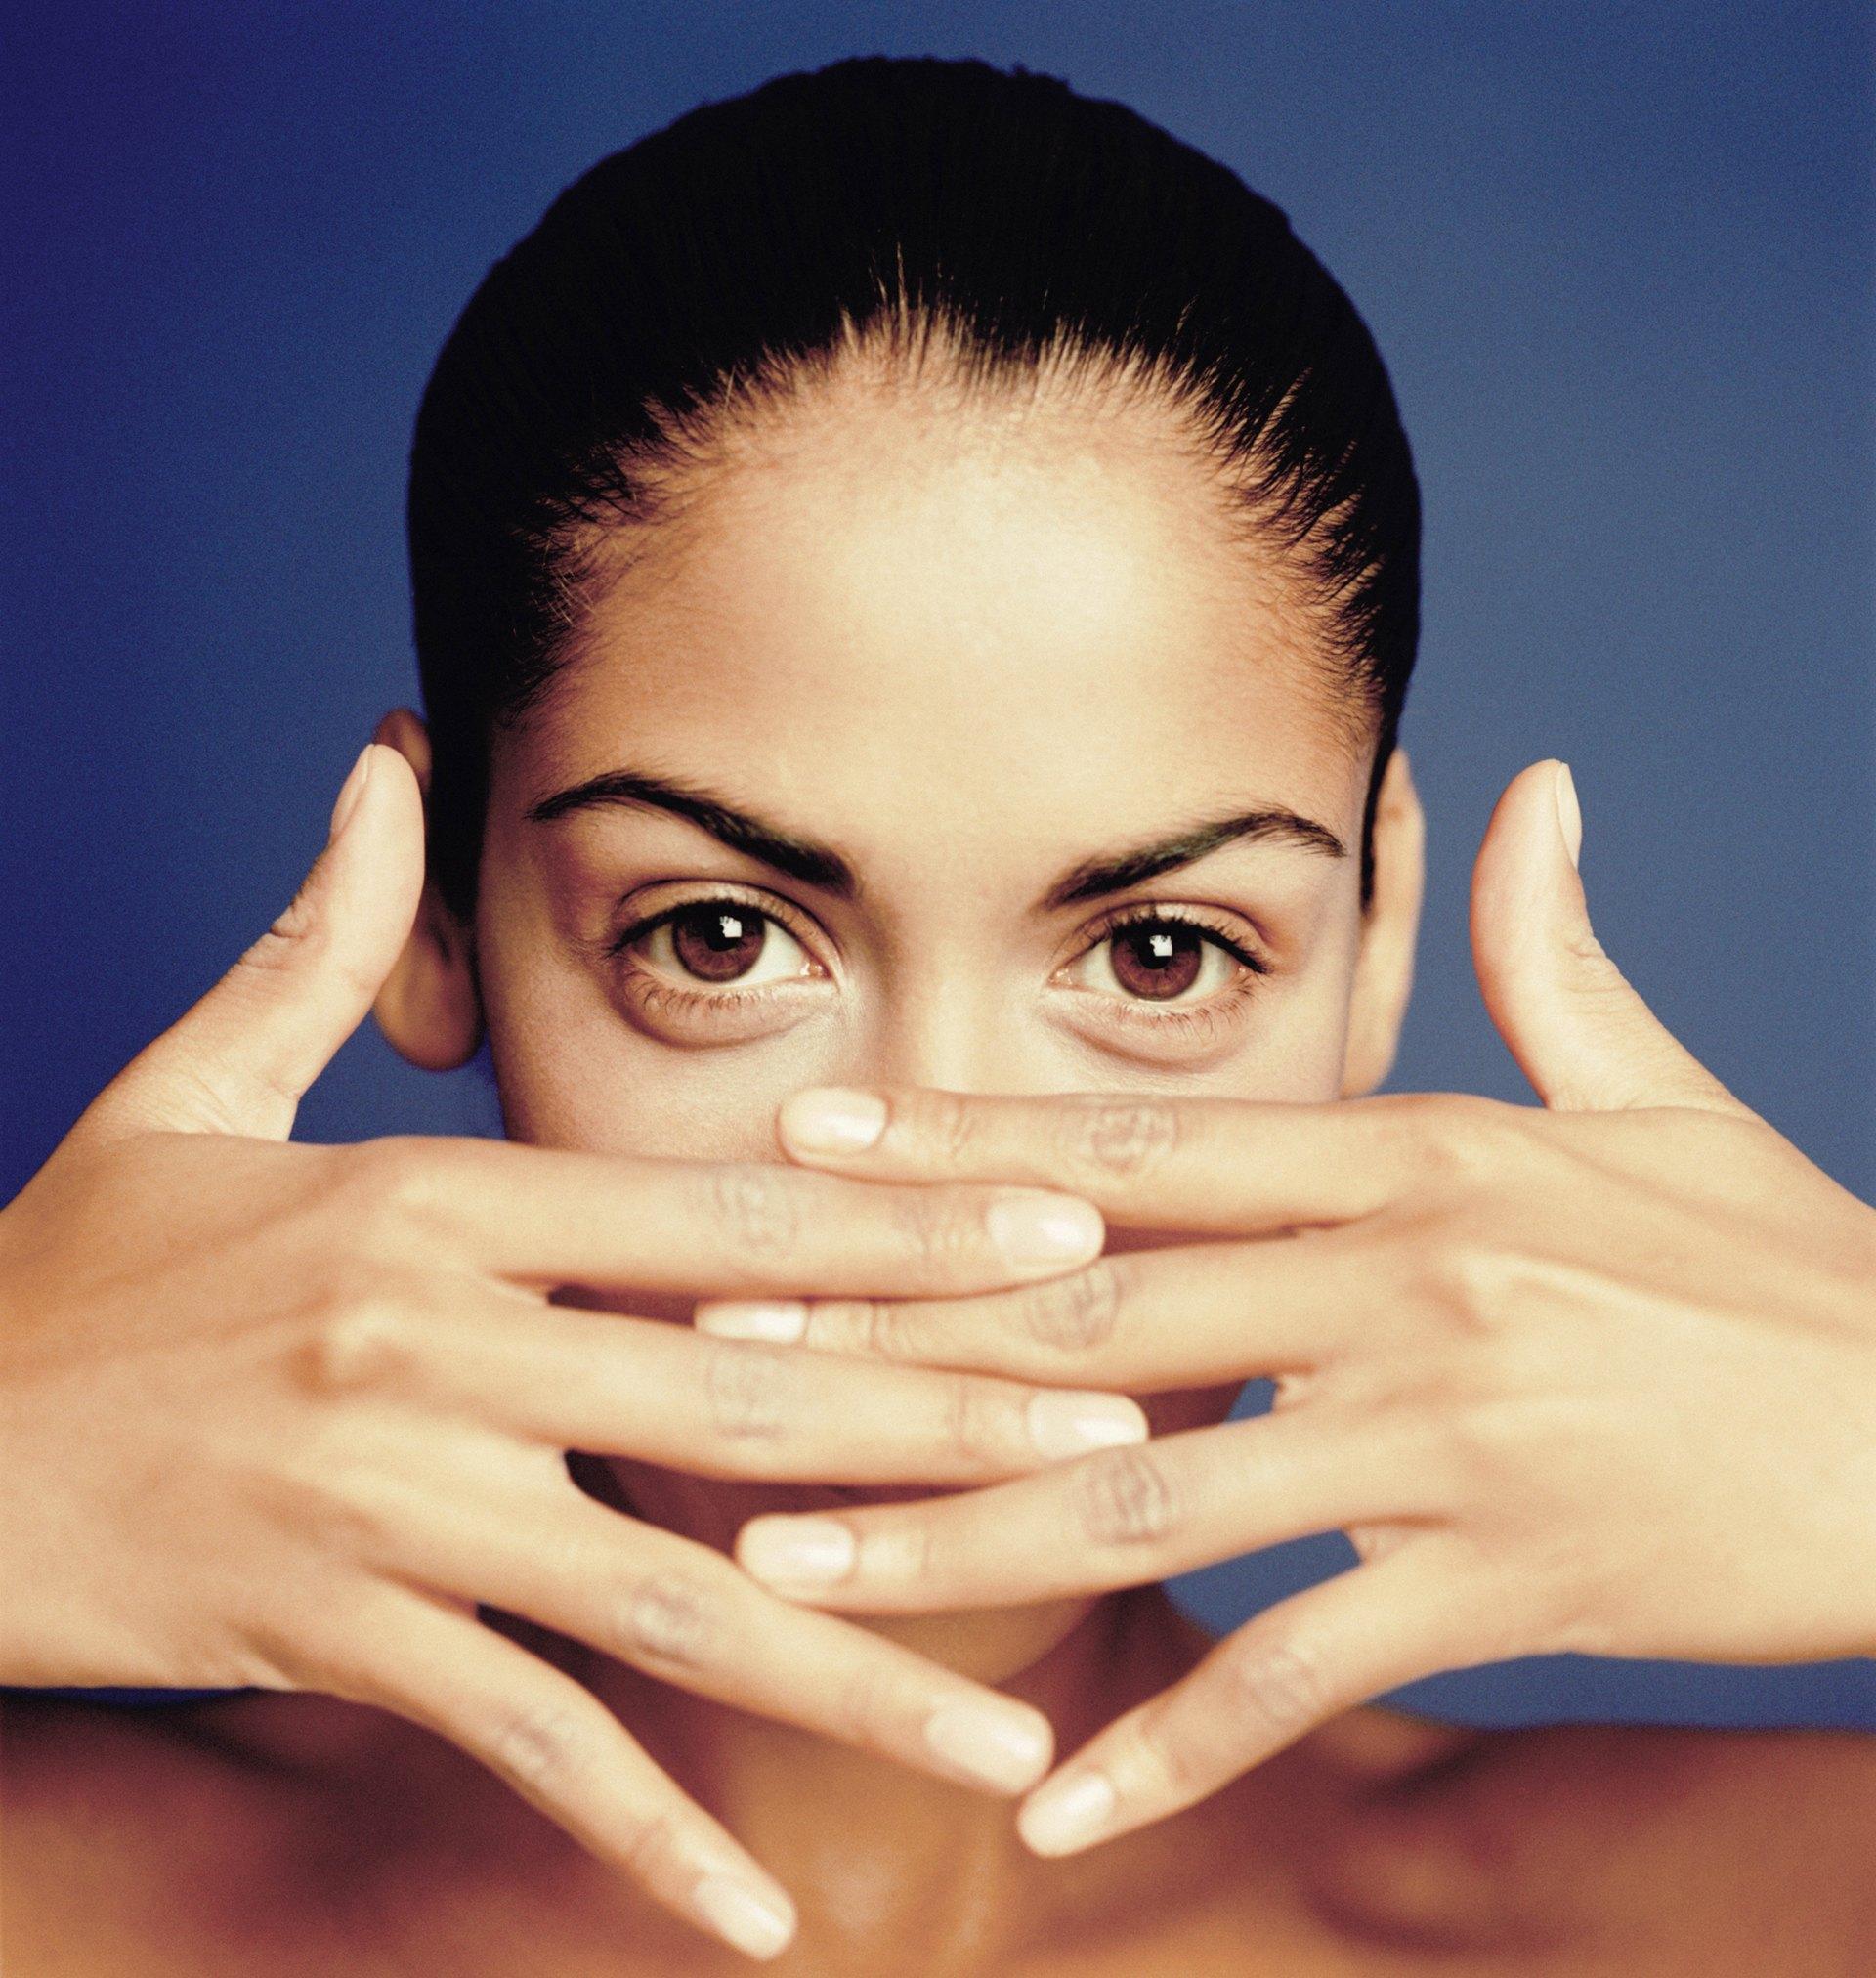 Splitting & Peeling Nails from a Vitamin Deficiency   LIVESTRONG.COM